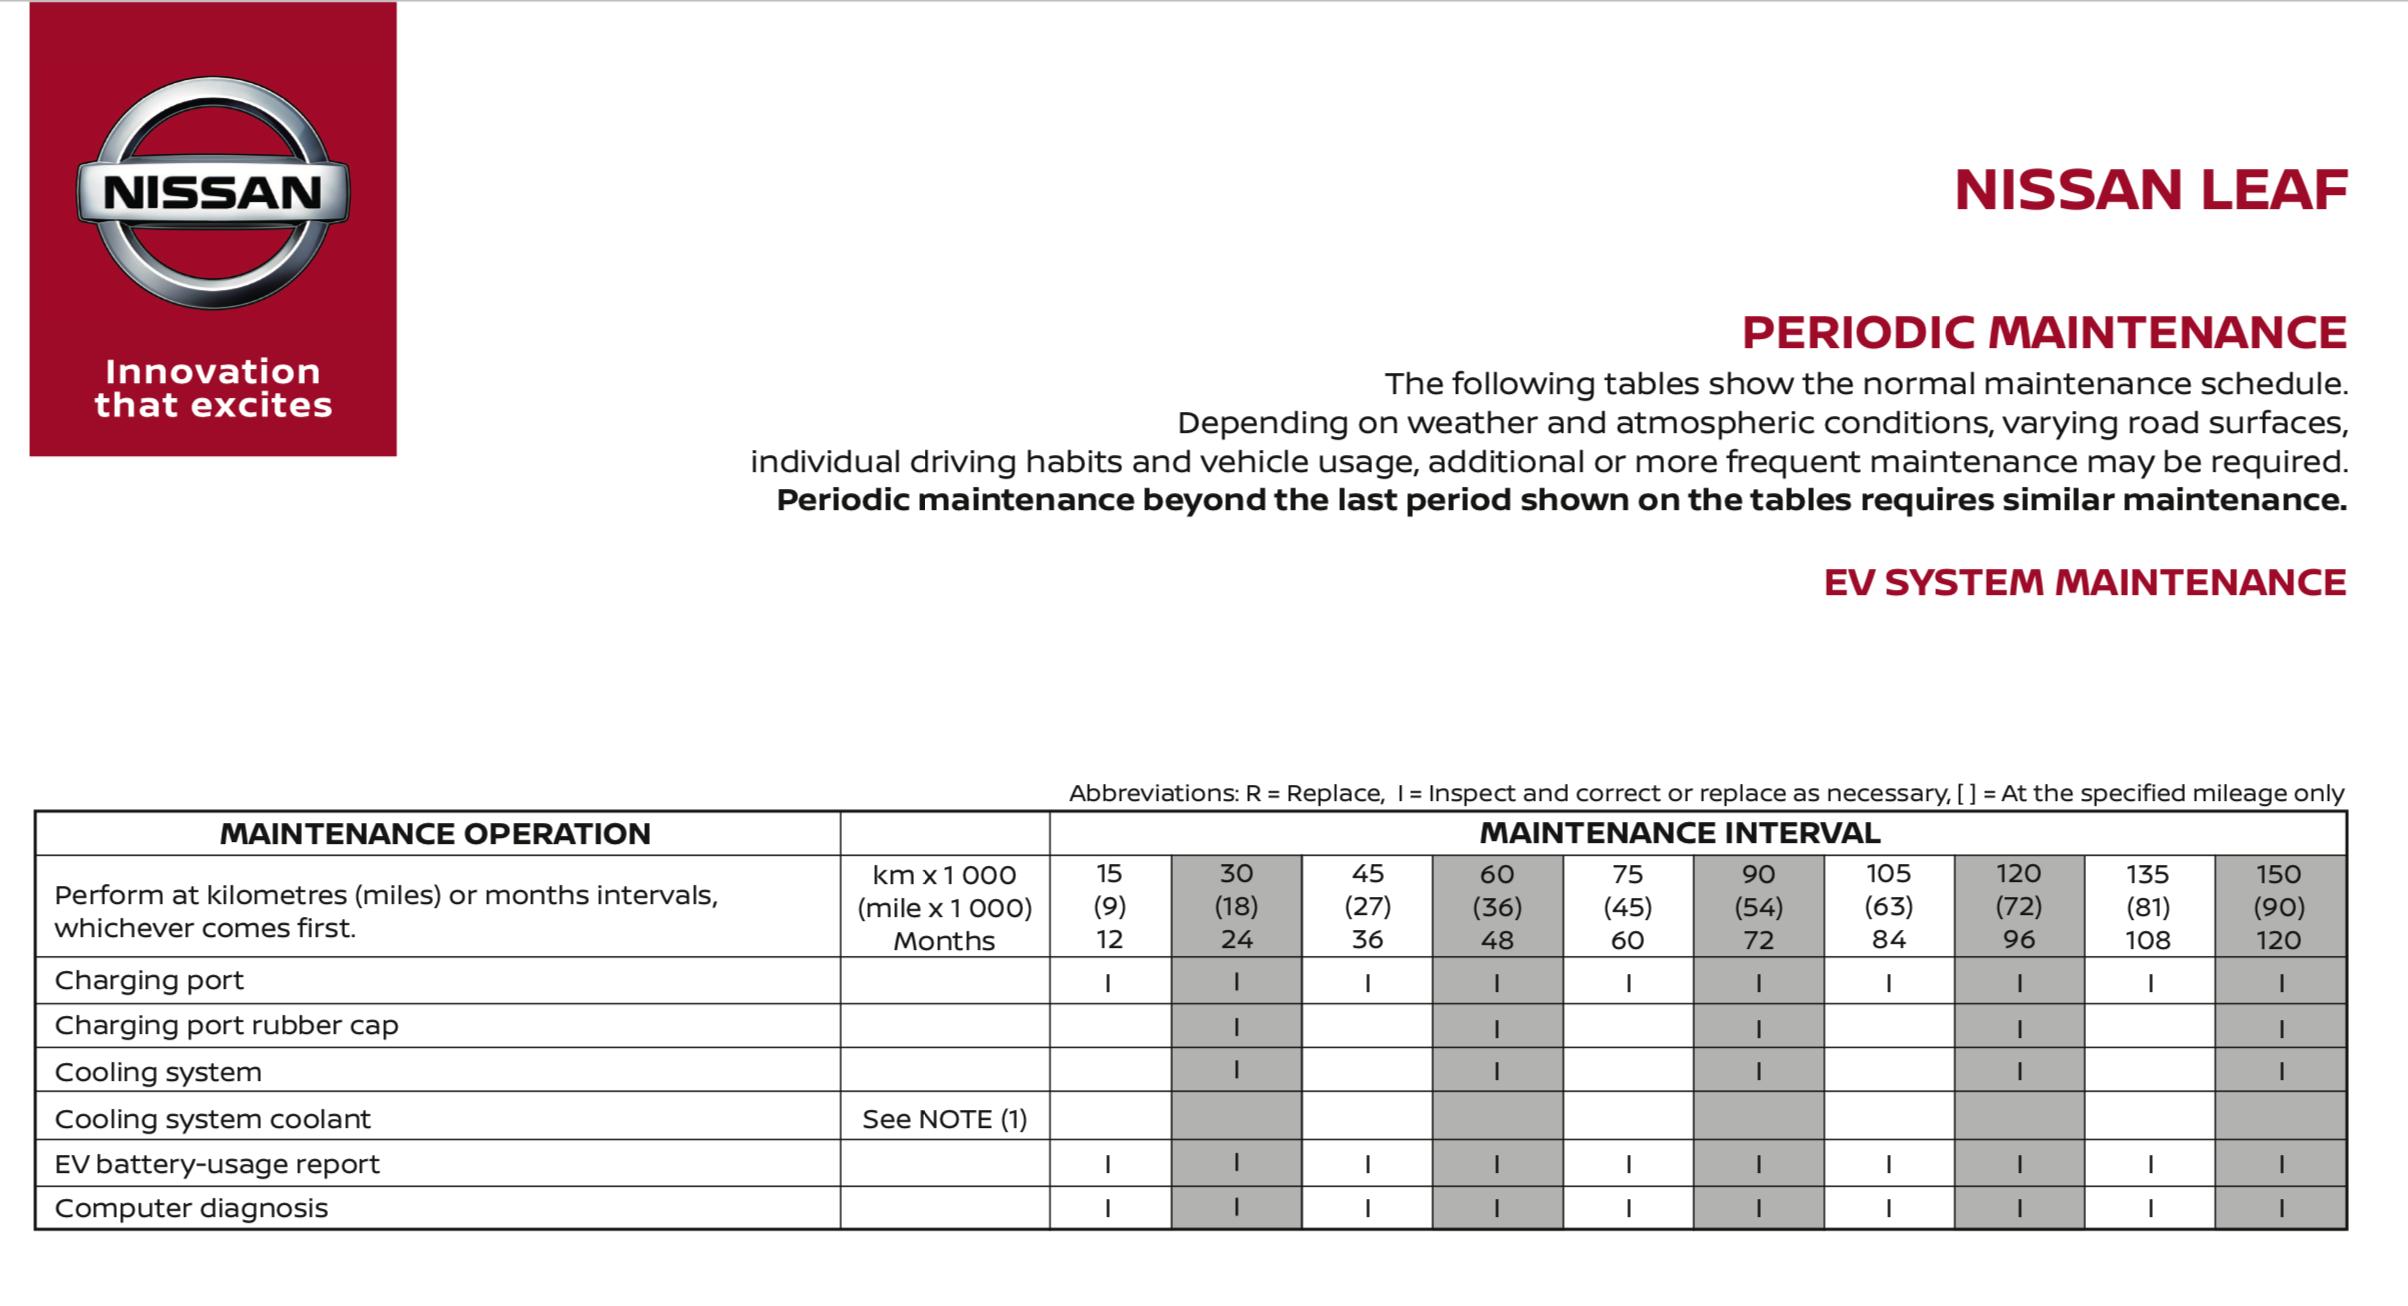 Periodic Maintenance (cервисное обслуживание)